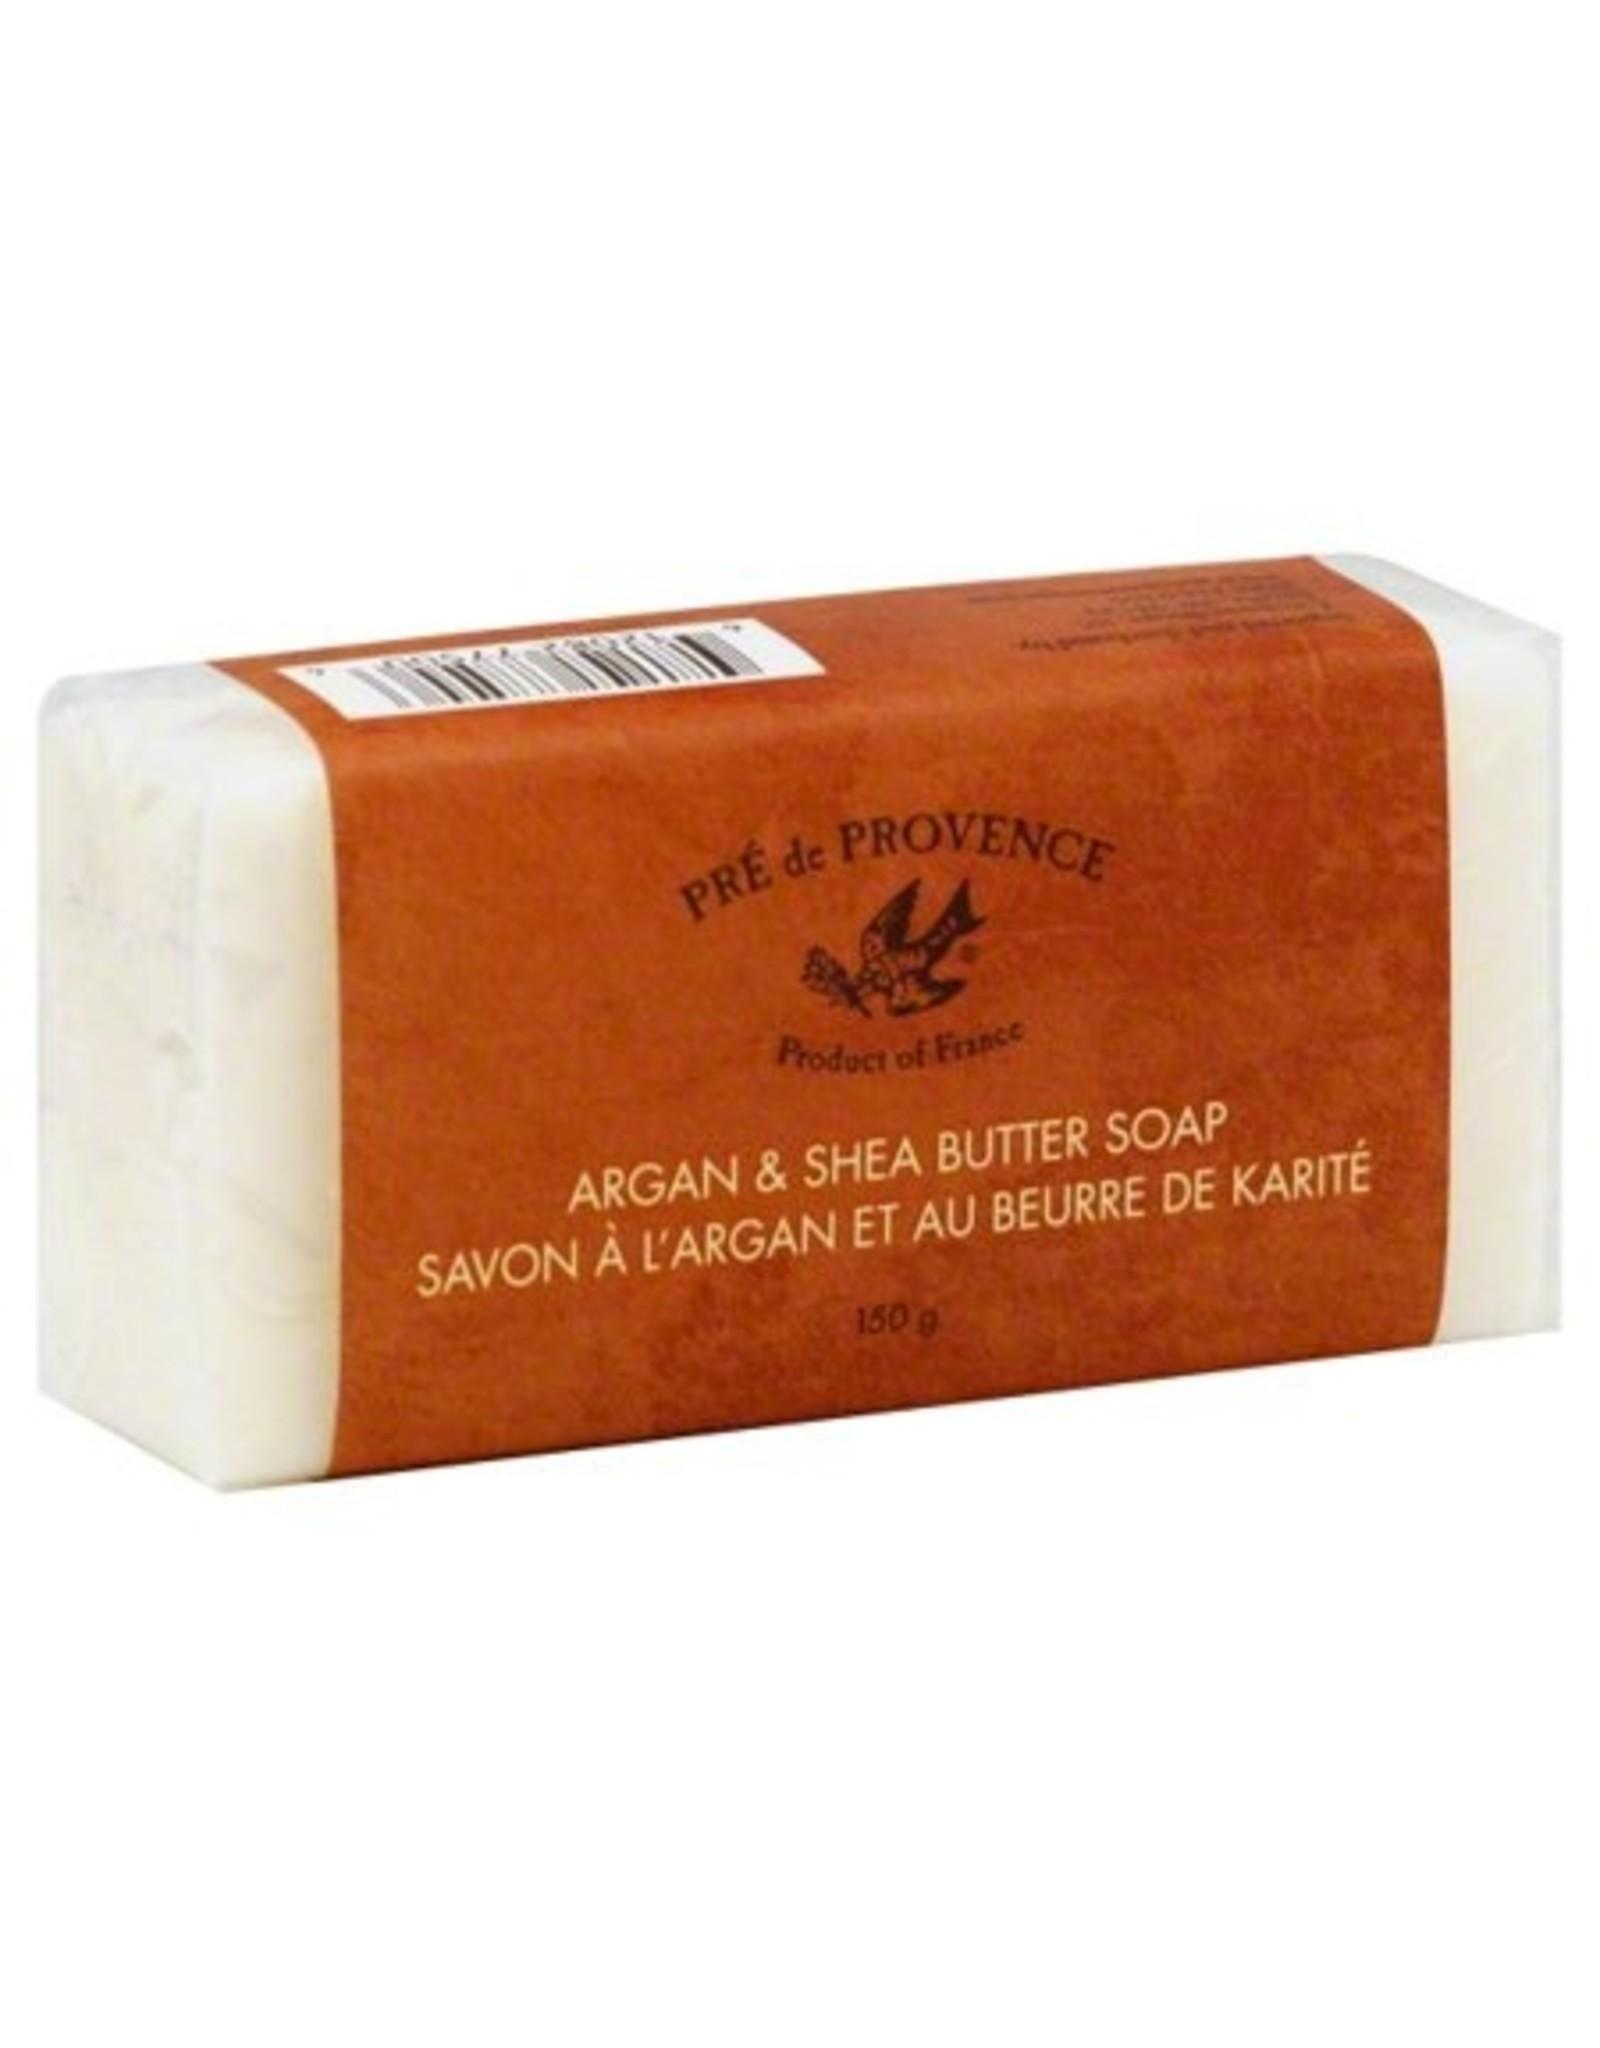 European Soaps Argan & Shea Butter Soap